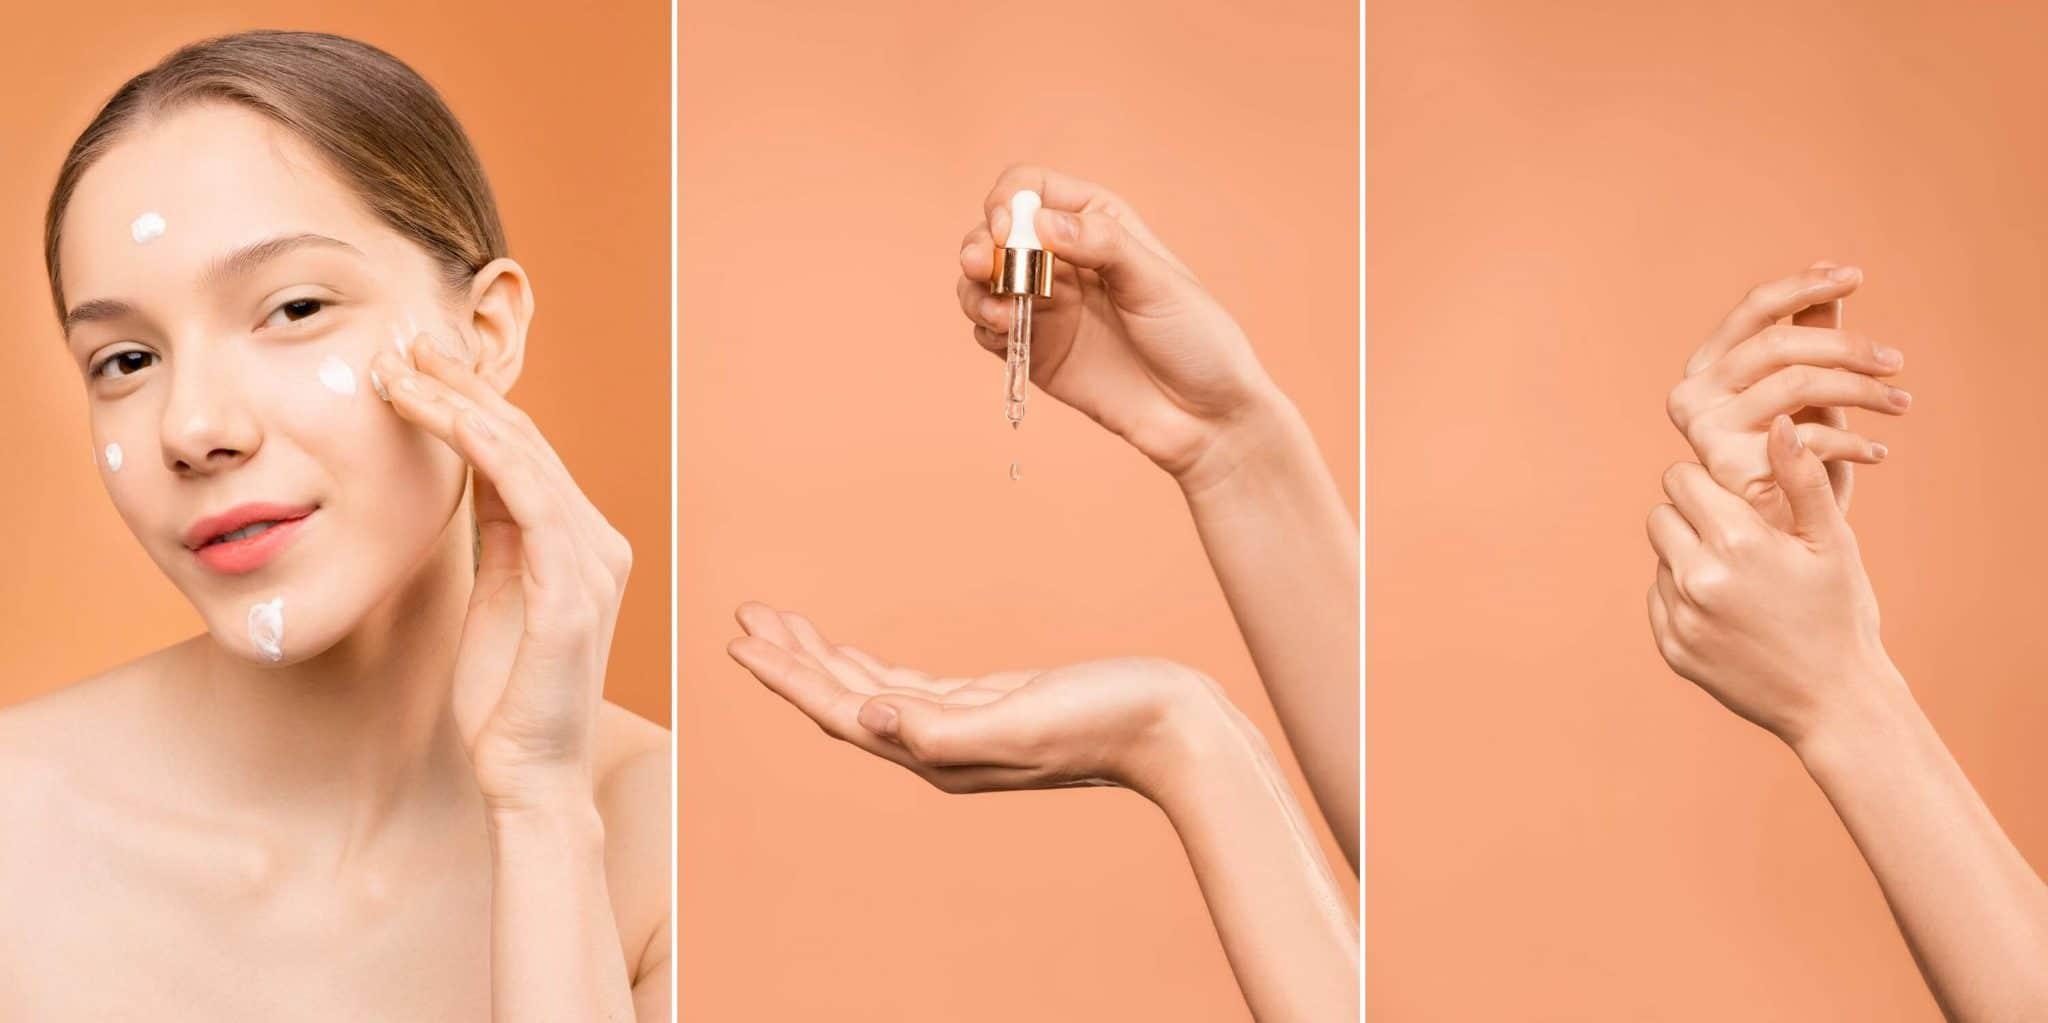 Woman essential oil